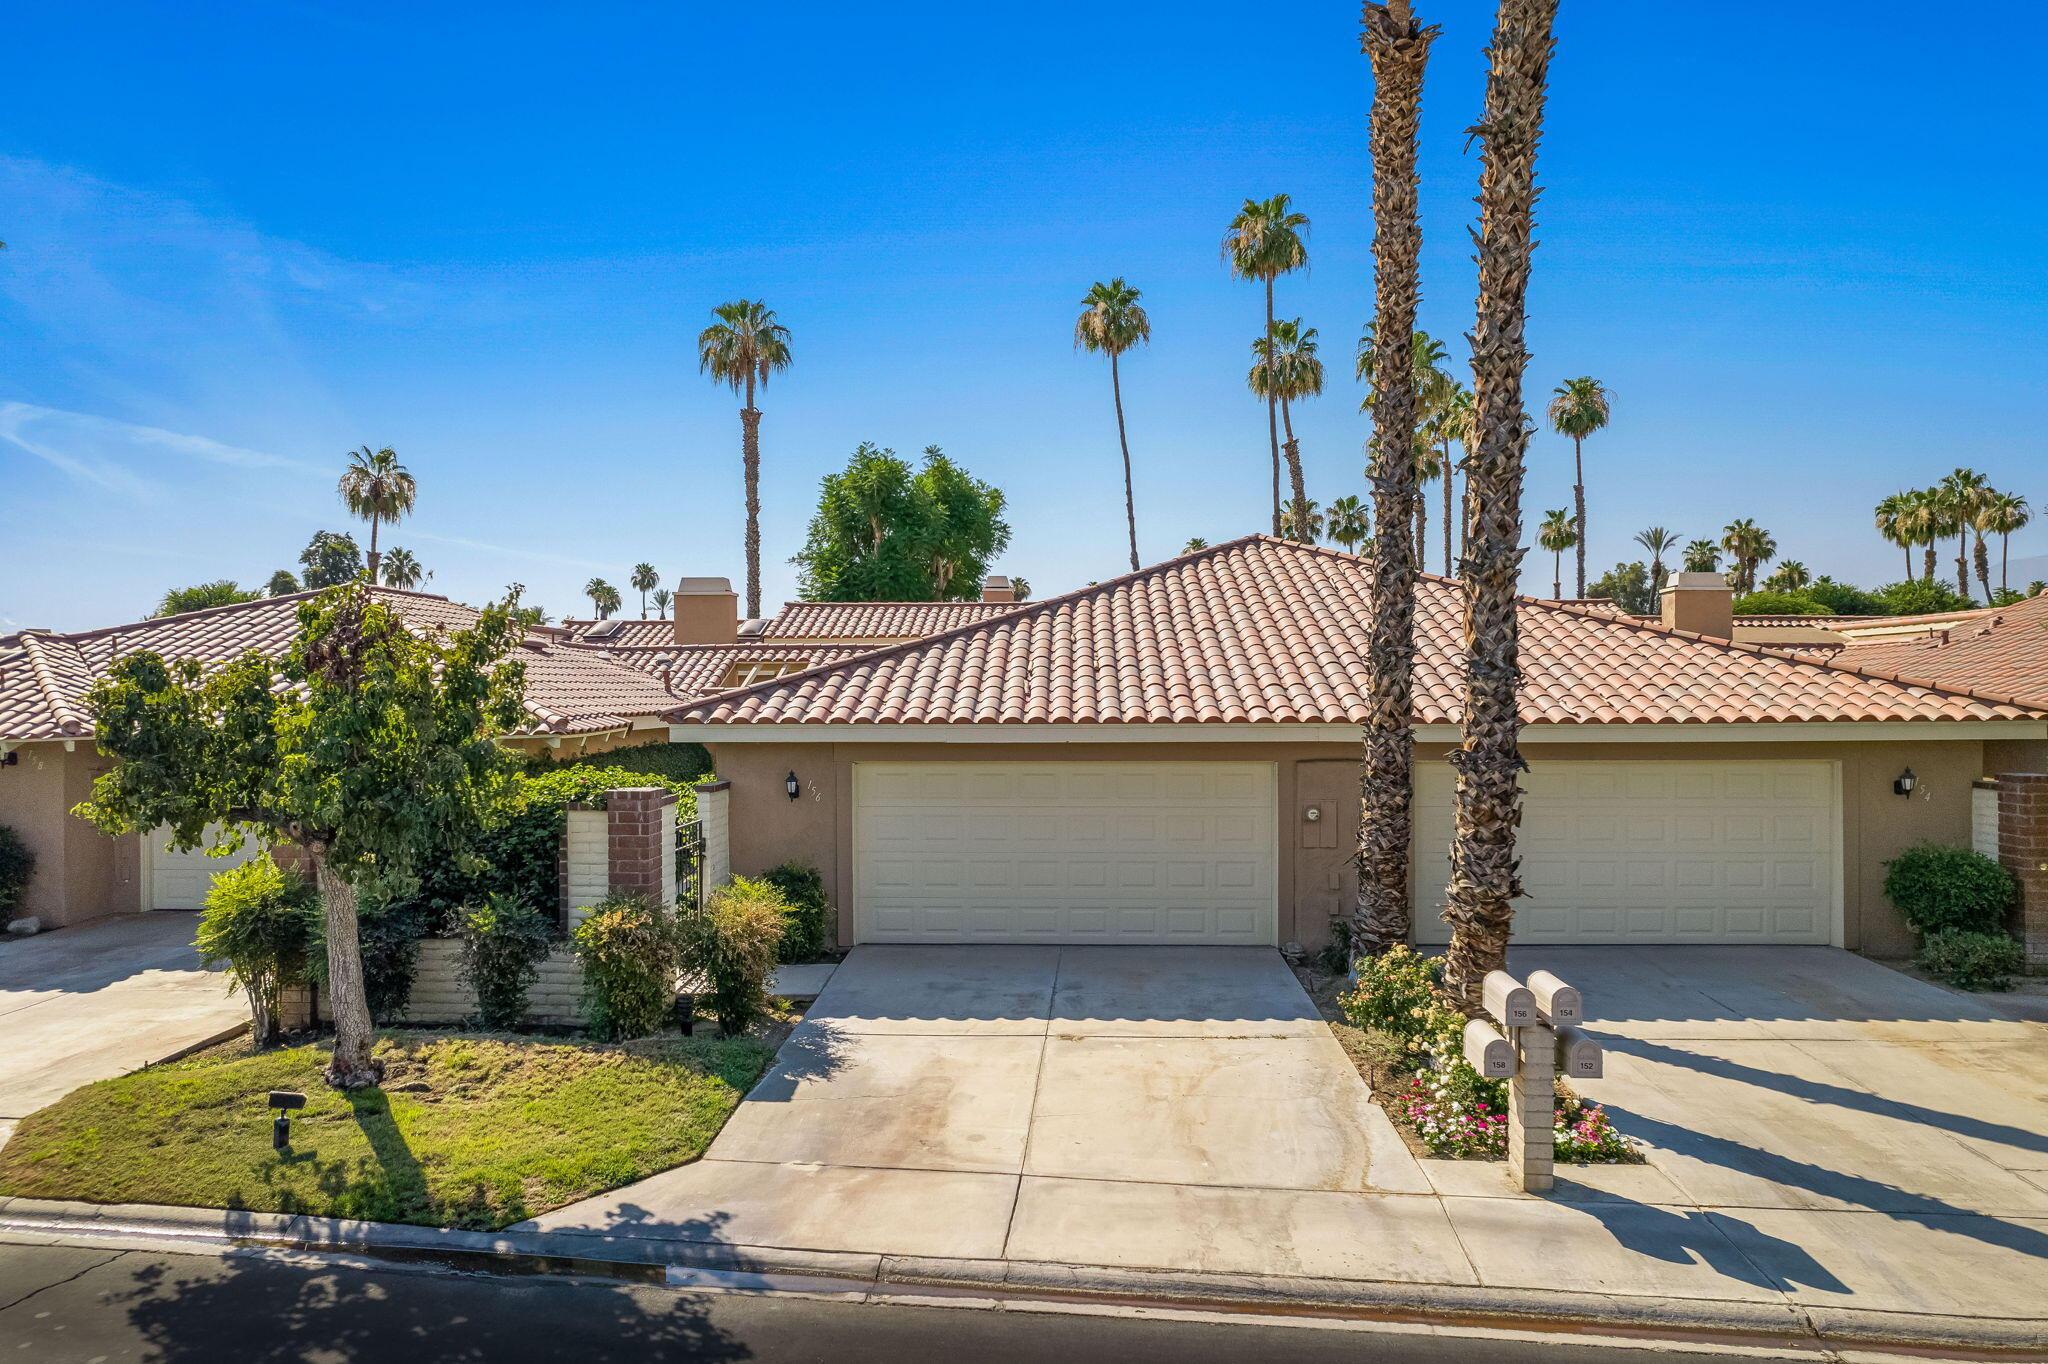 Photo of 156 Las Lomas, Palm Desert, CA 92260